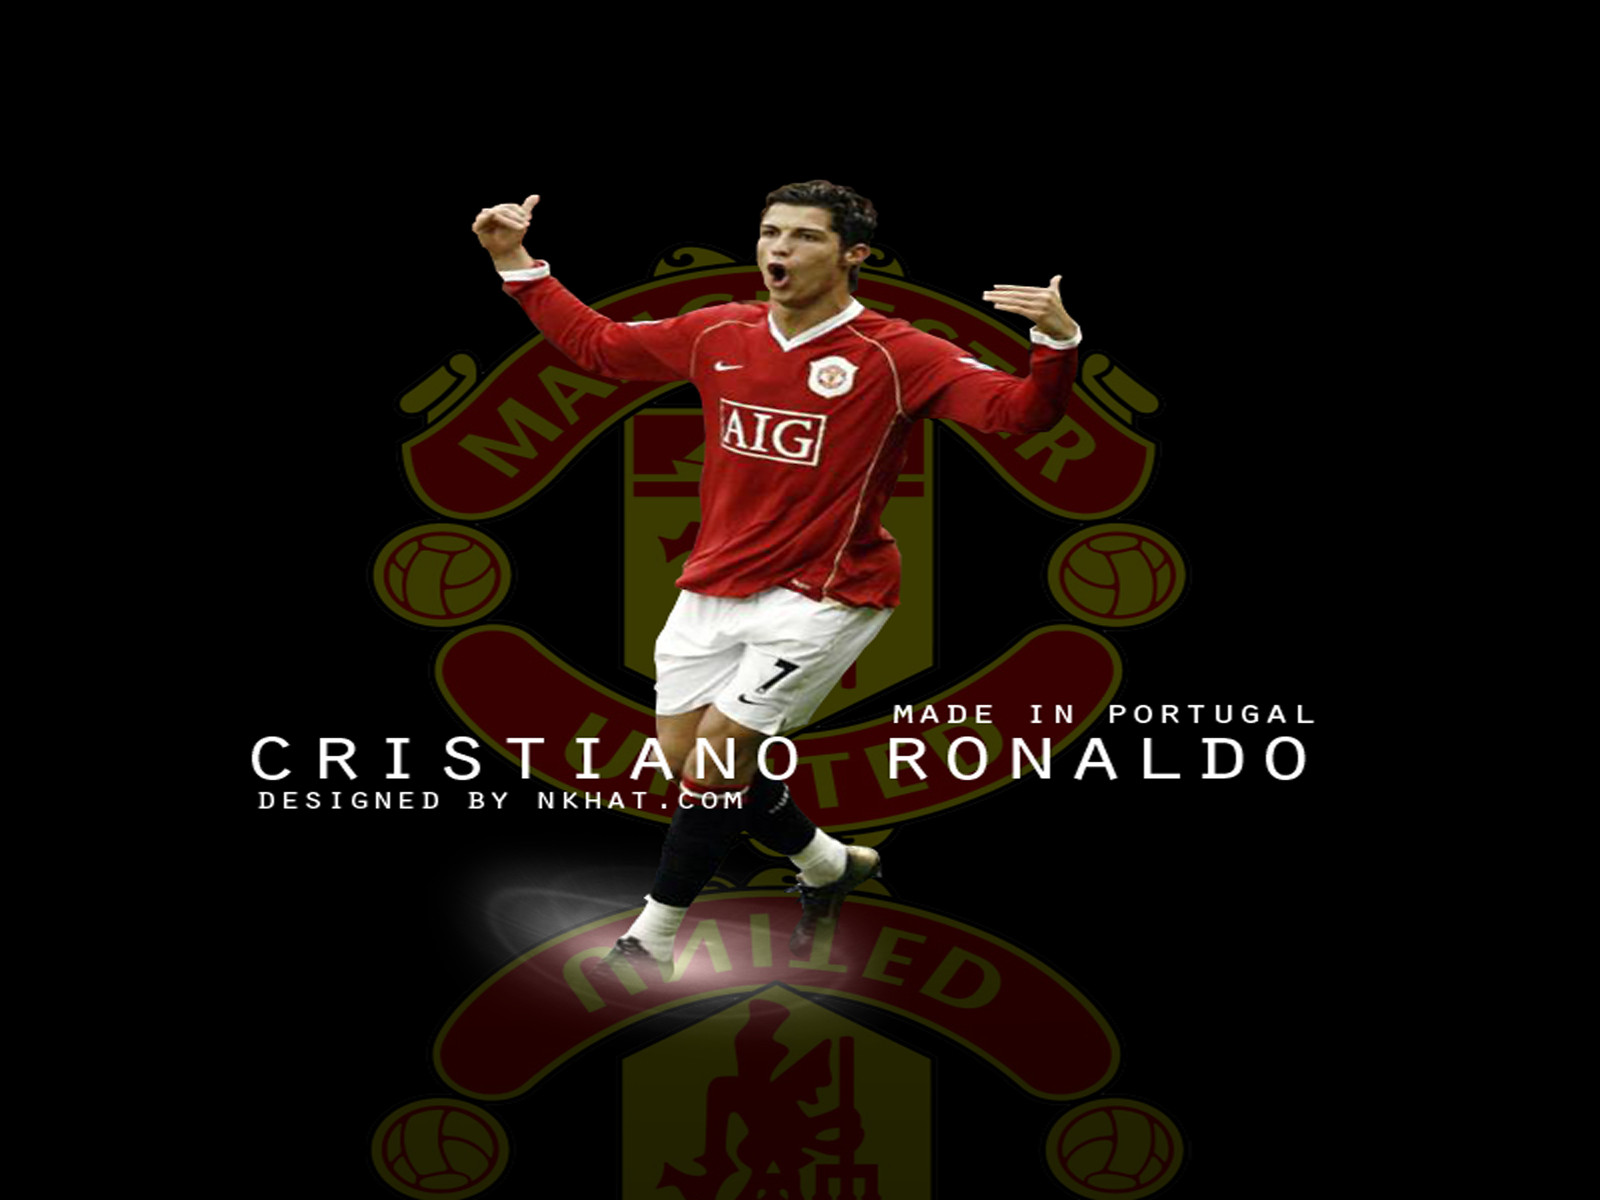 حصرياً فيديو بعنوان Cristiano Ronaldo